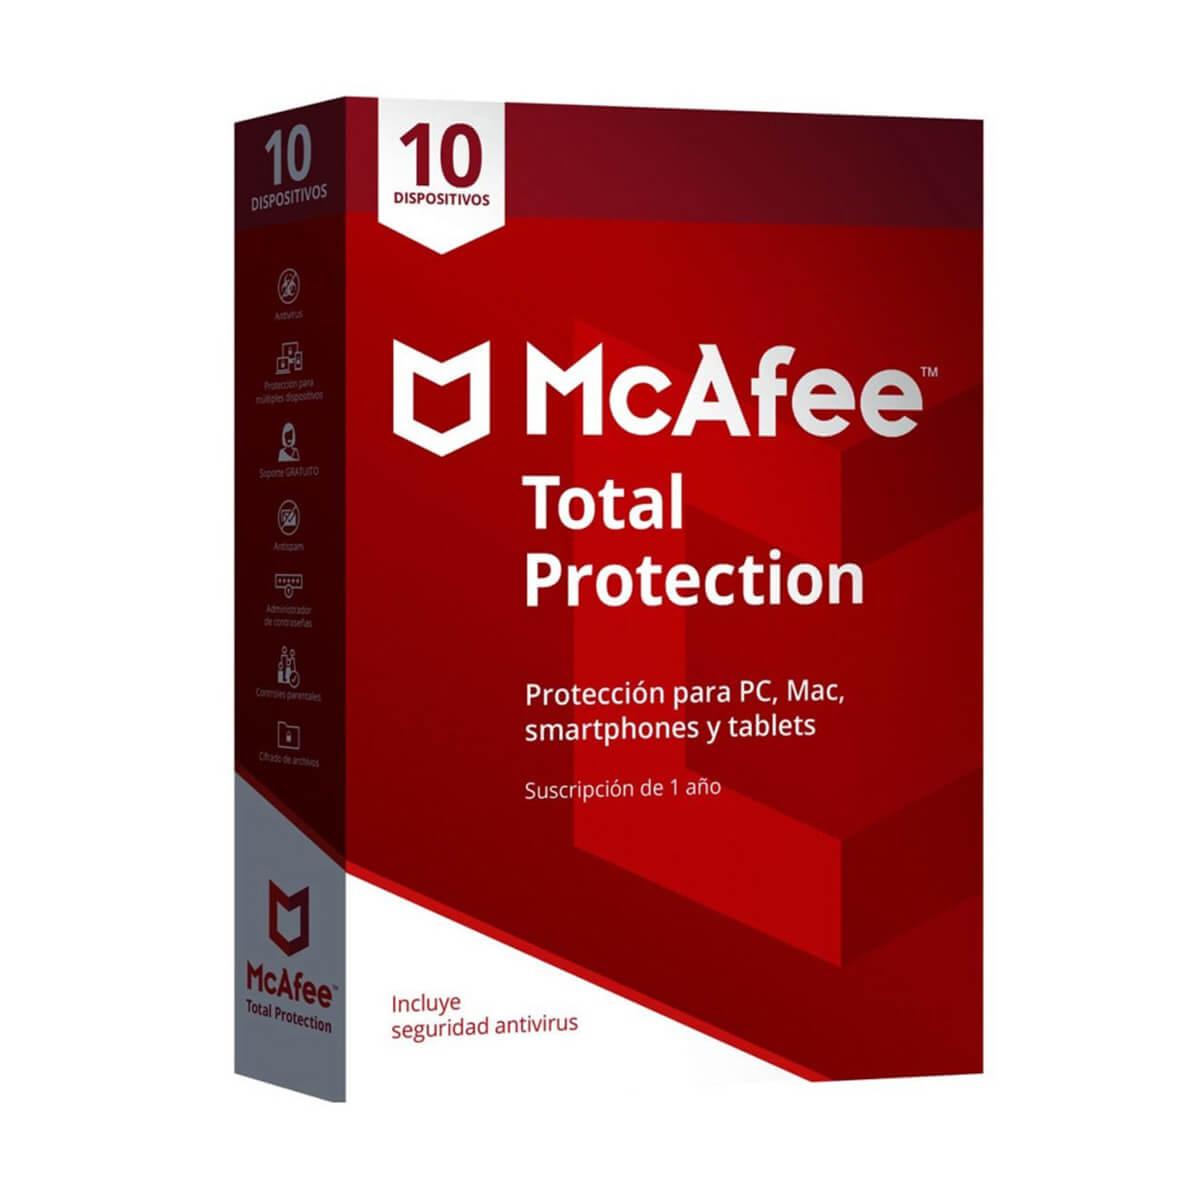 McAfee-Antivirus-01